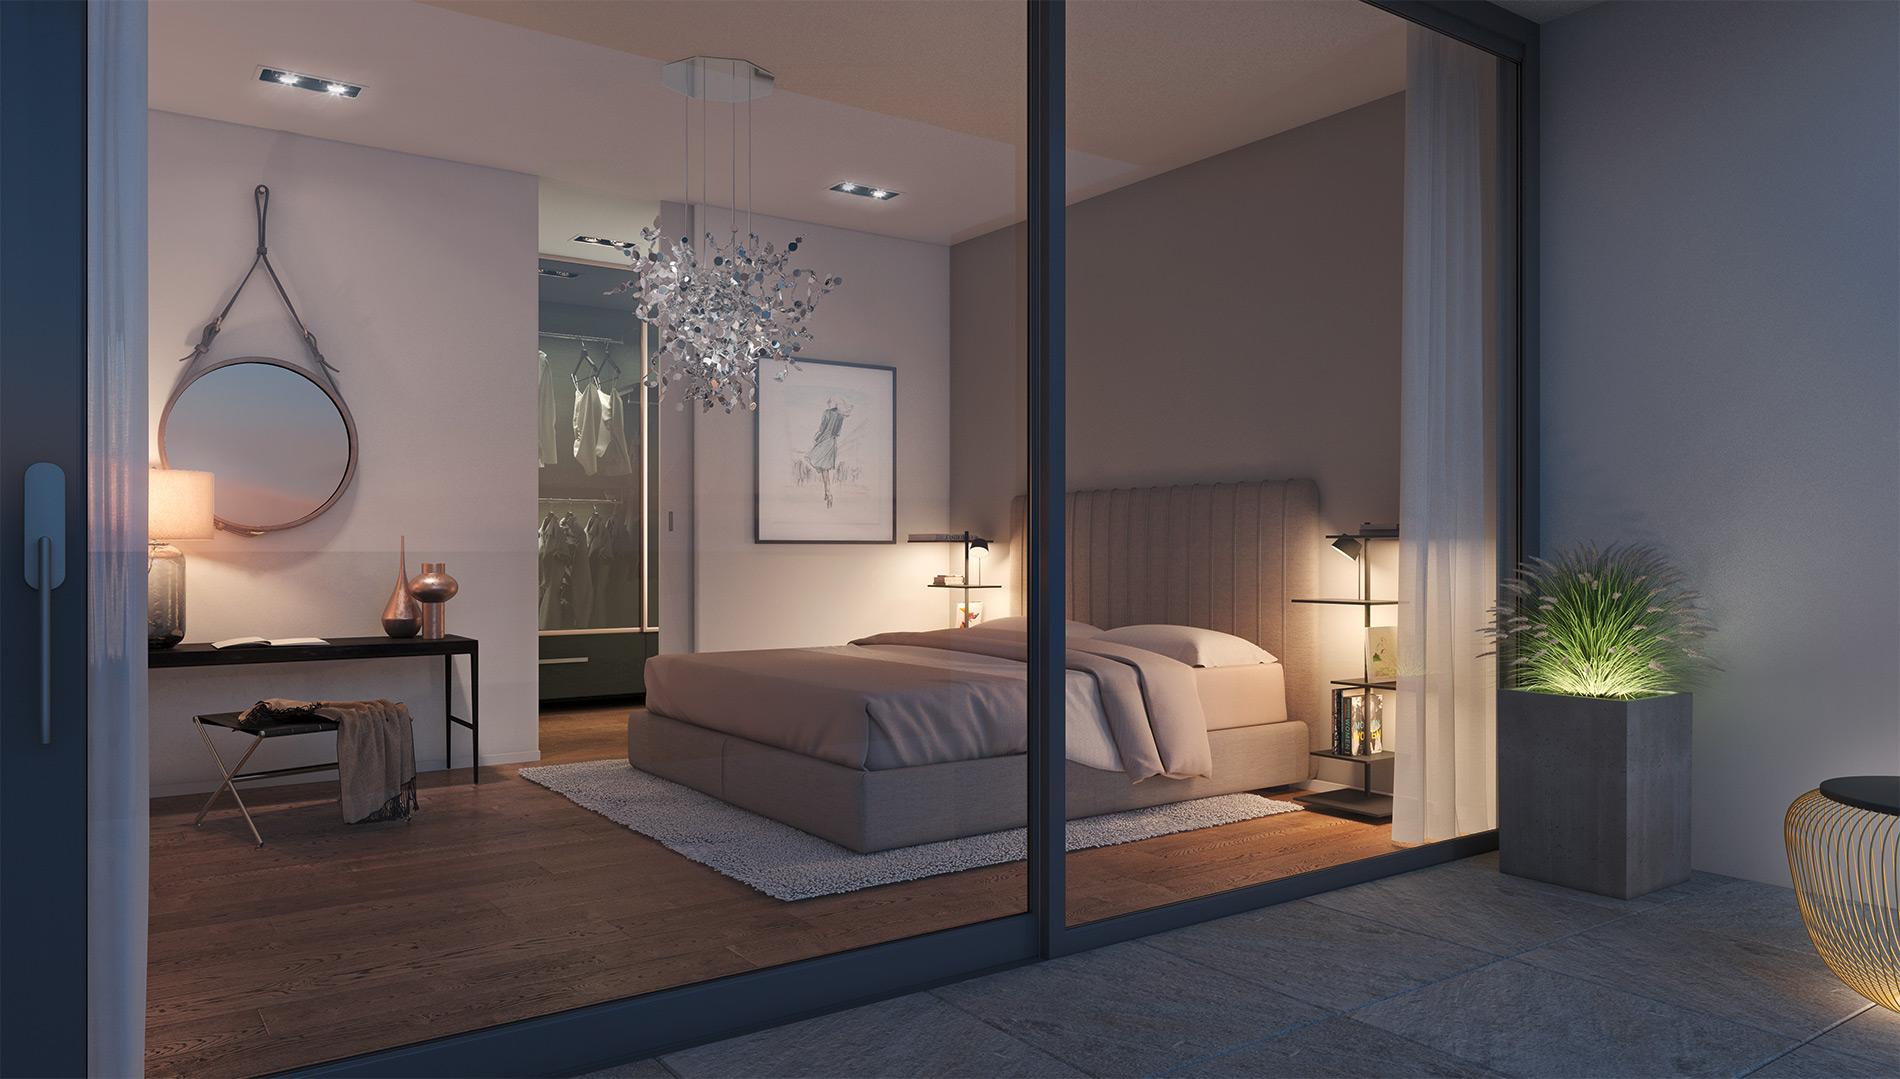 "goethegasse1-image_austattung_schlafzimmer home decor 5 Wonderful Home Decor Ideas By ""Goethegasse 1"" To Copy goethegasse1 image austattung schlafzimmer"